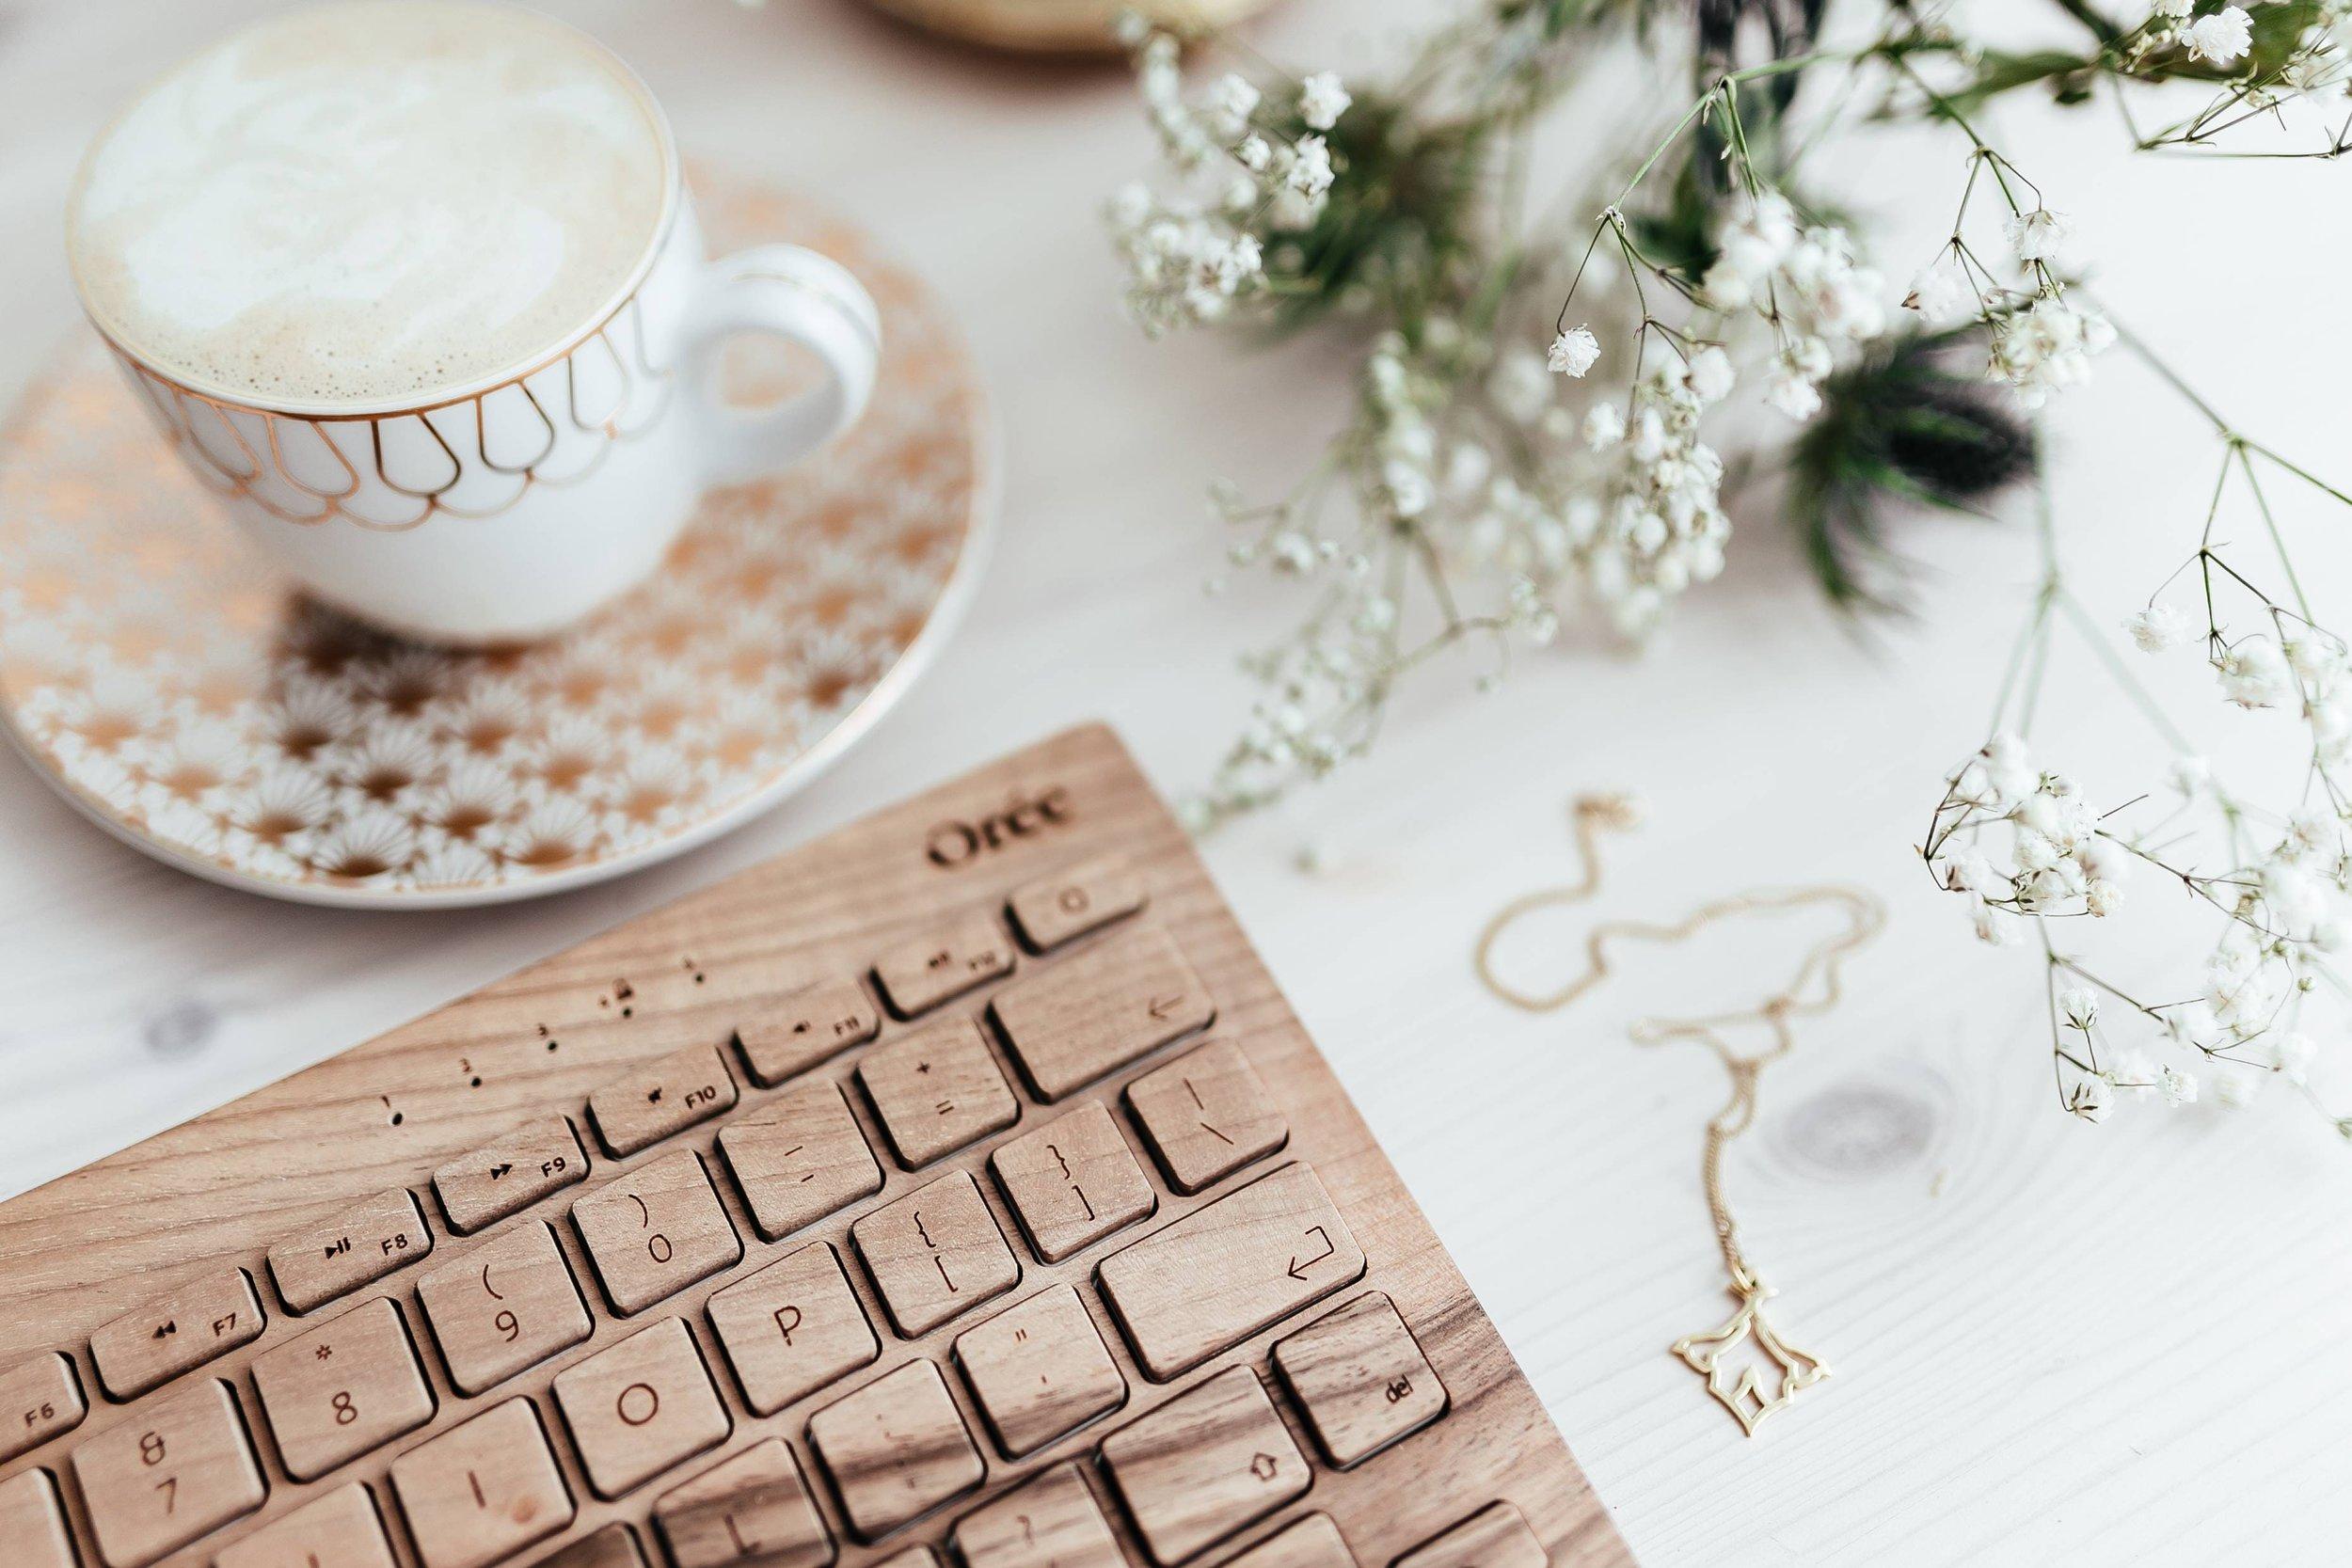 kaboompics_Wooden keyboard, coffee and golden jewellery.jpg